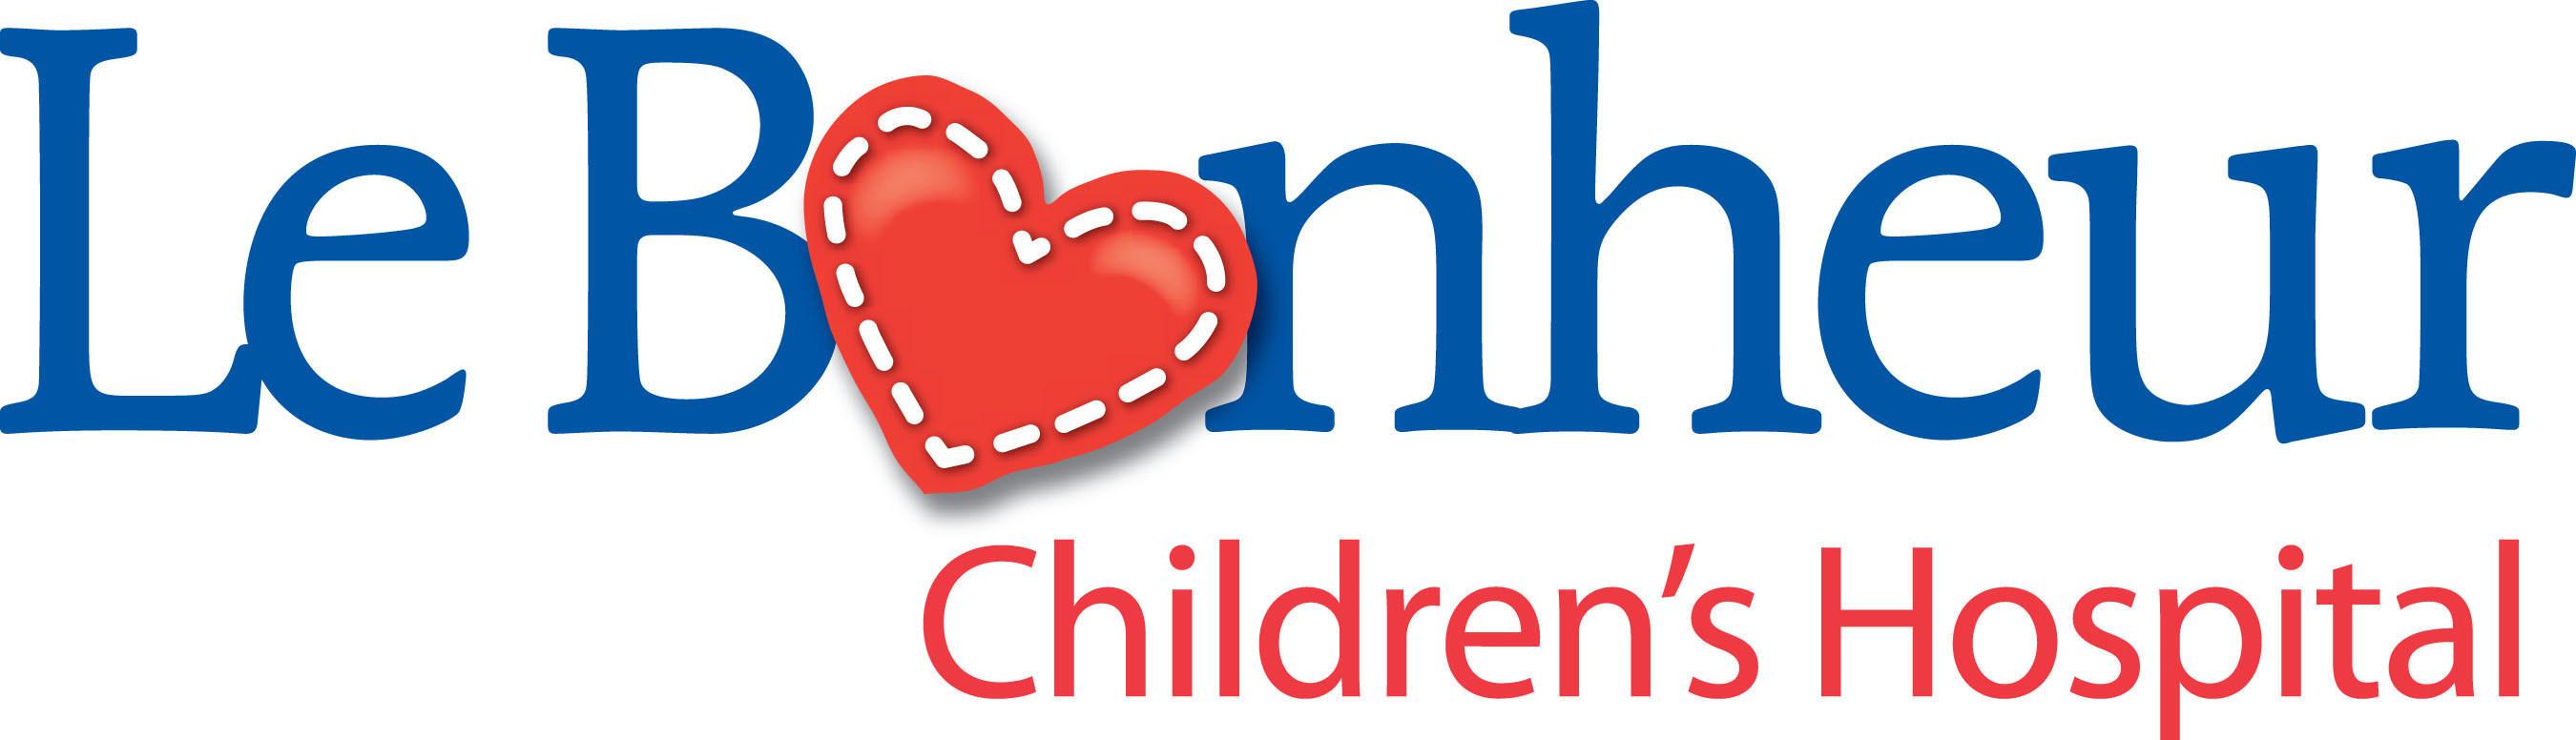 www.lebonheur.org/promise